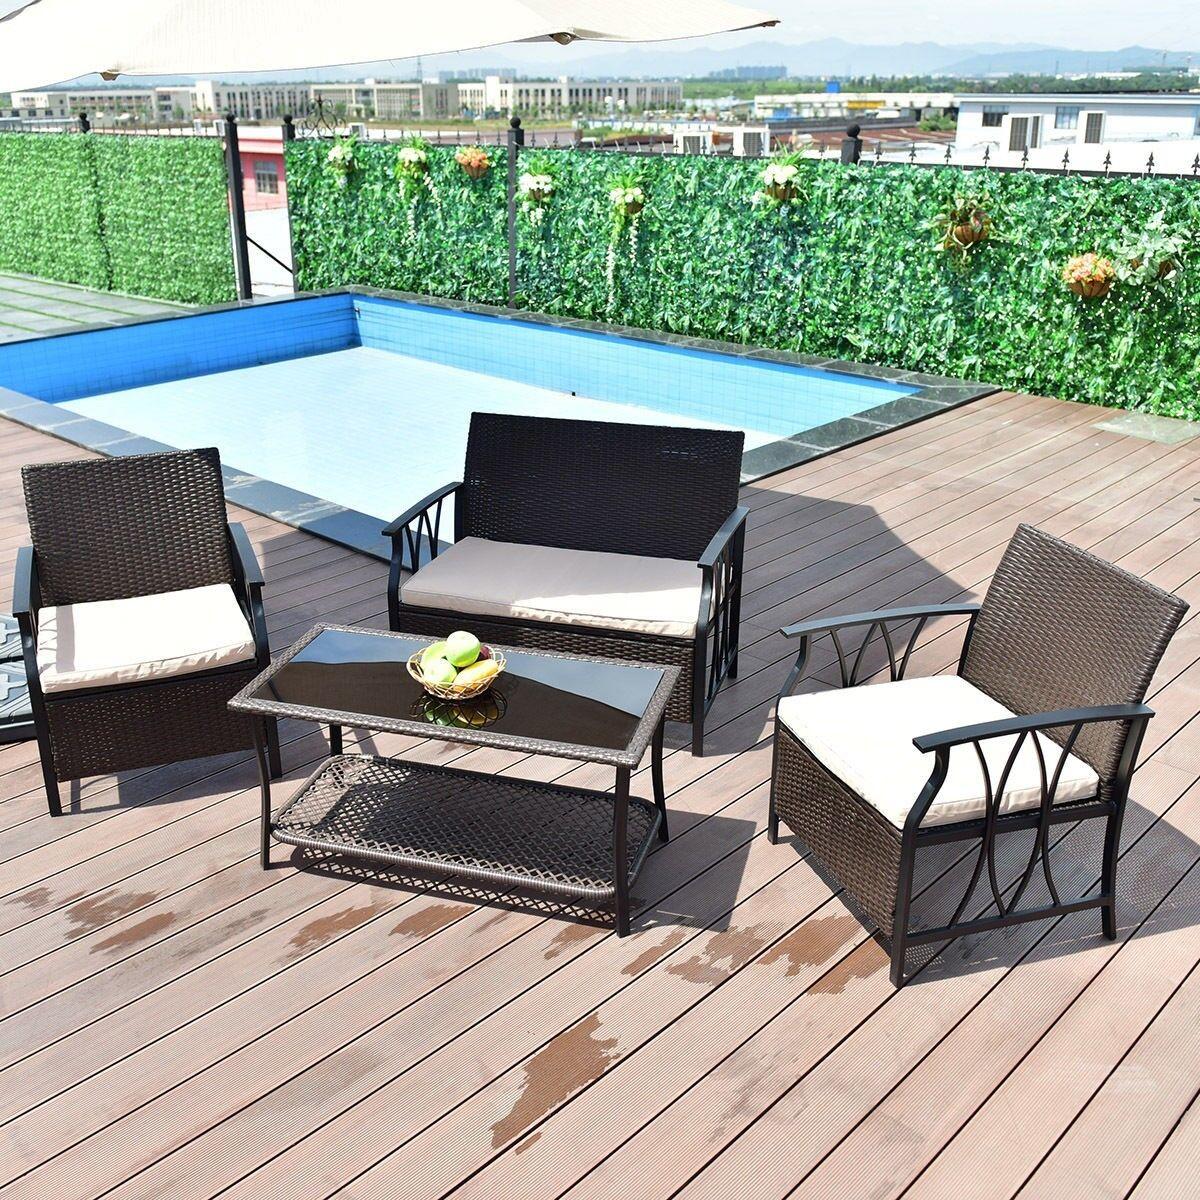 Outdoor Rattan Set 4pcs Sofa PE Wicker Garden Lawn Patio Furniture ...